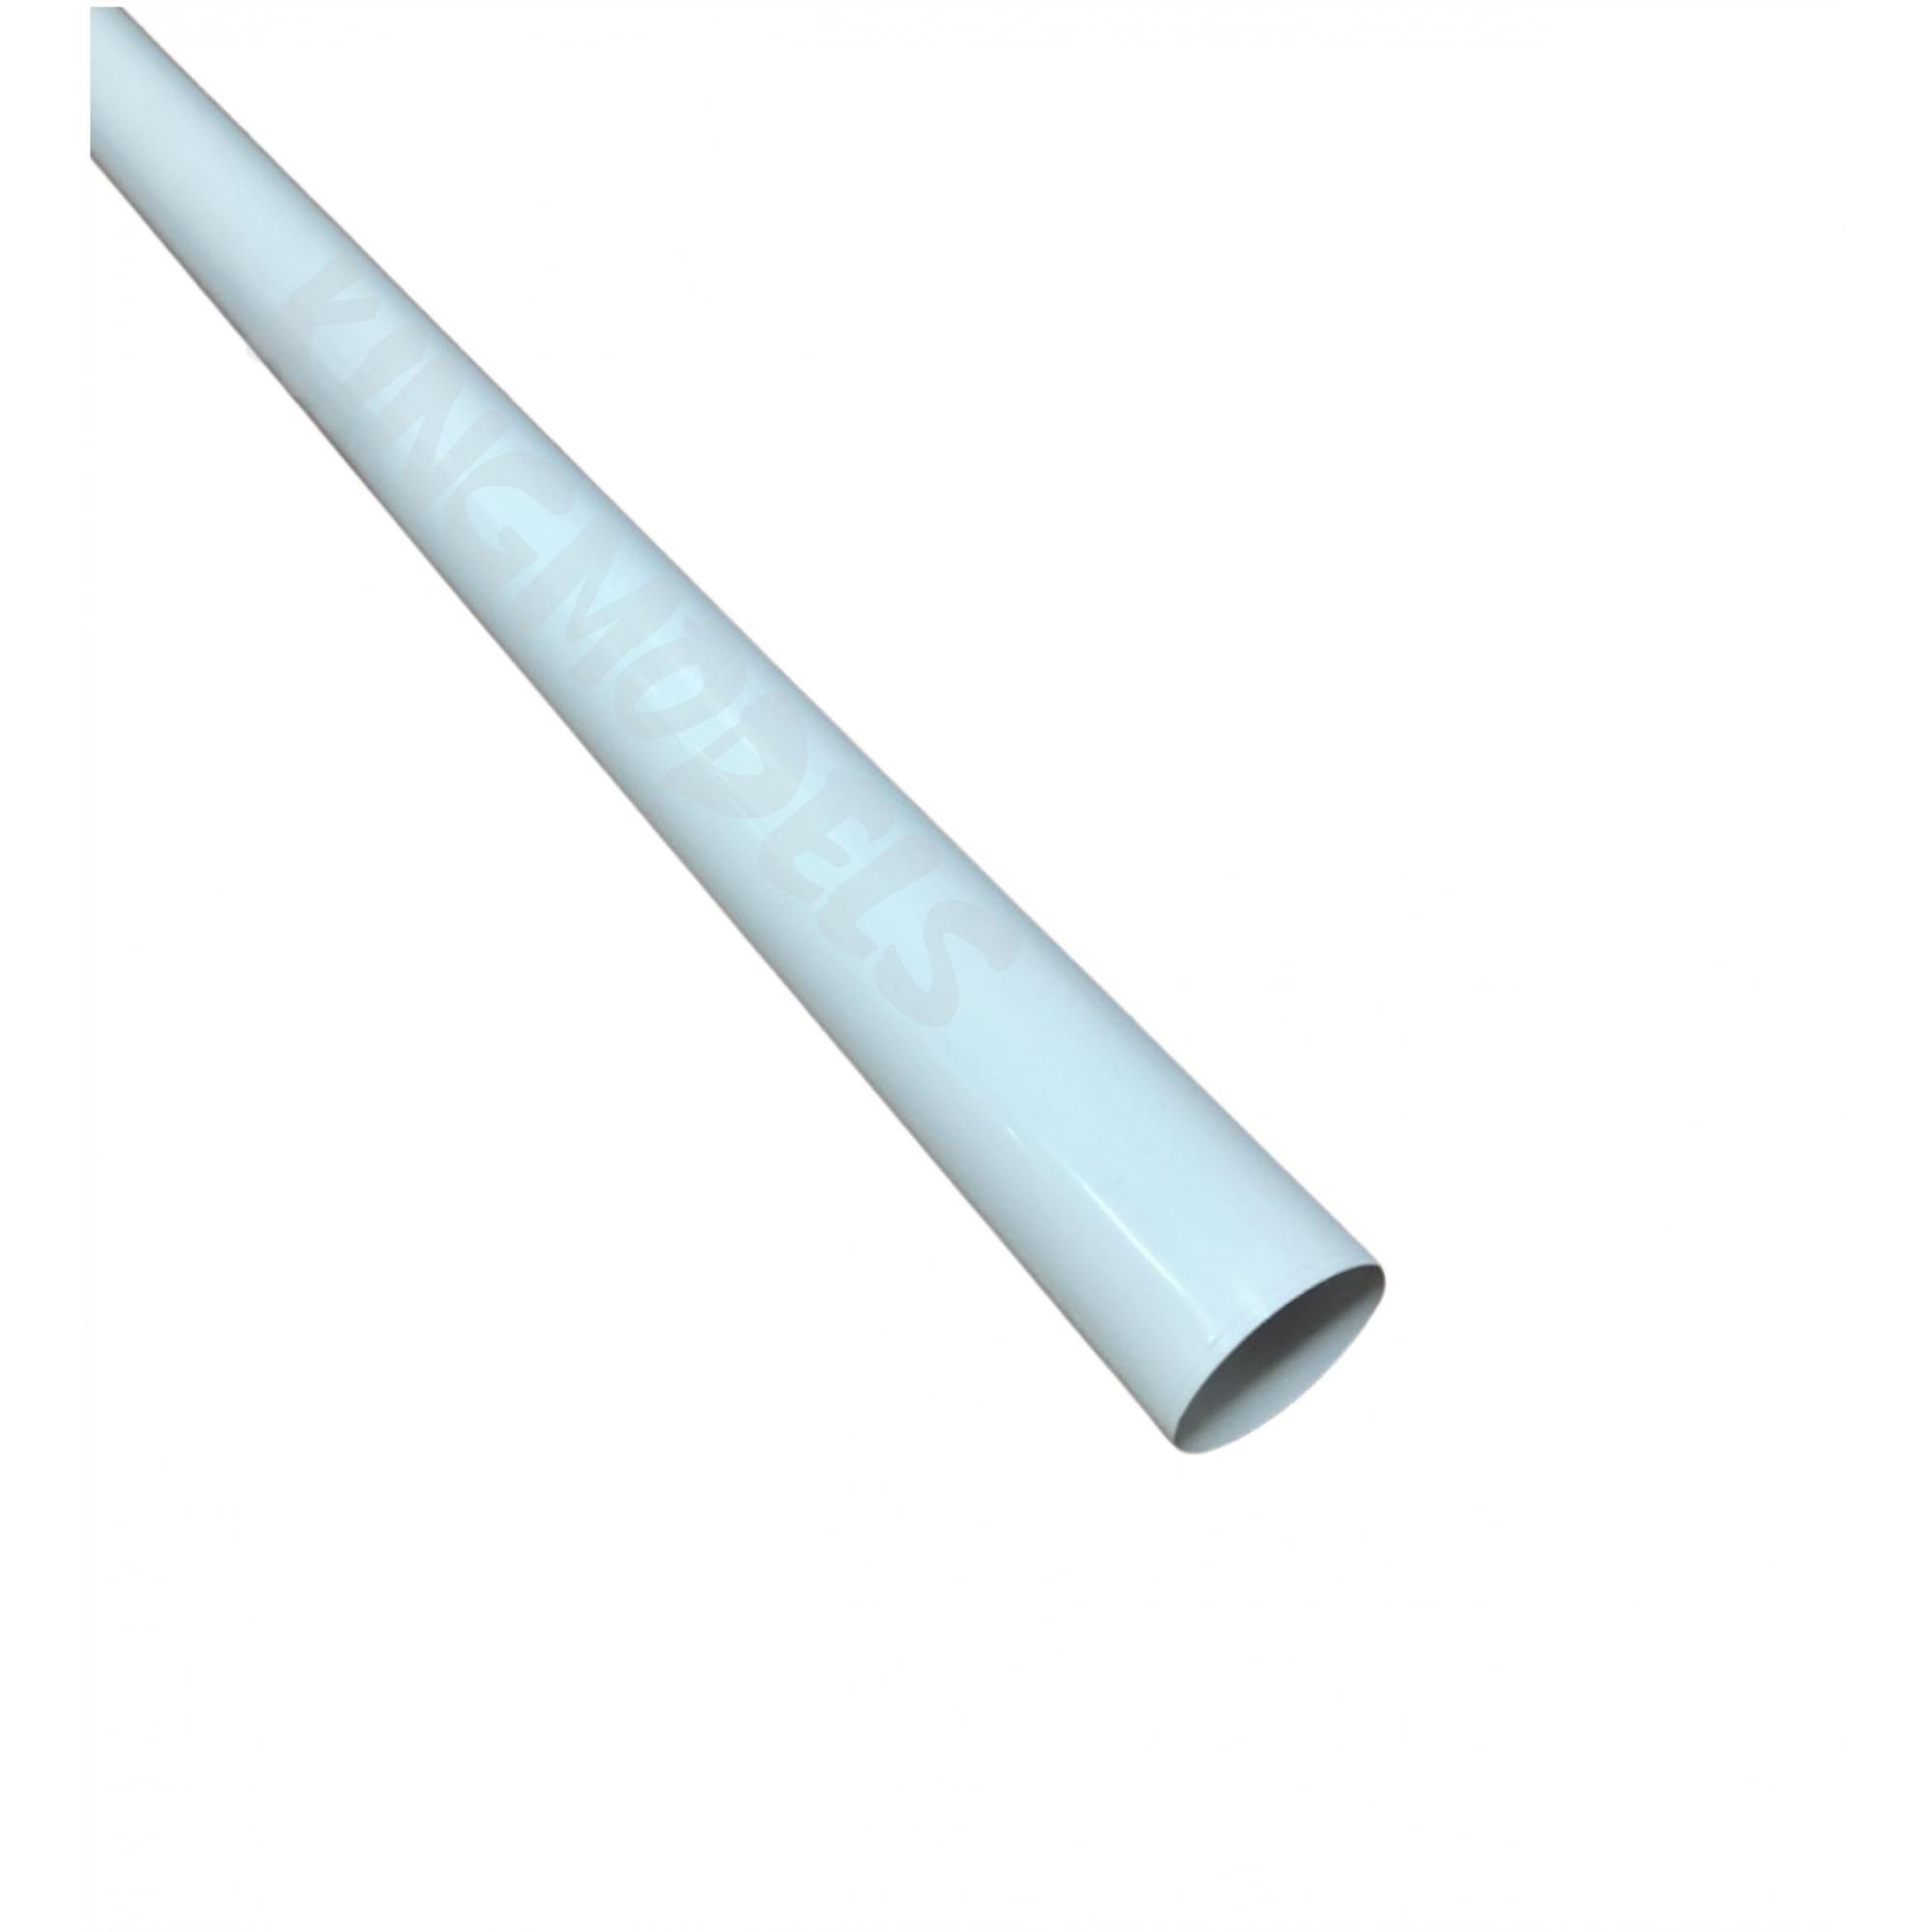 Chinakote (monokote)- Branco Sólido - 640mm - 1x Metro  - King Models